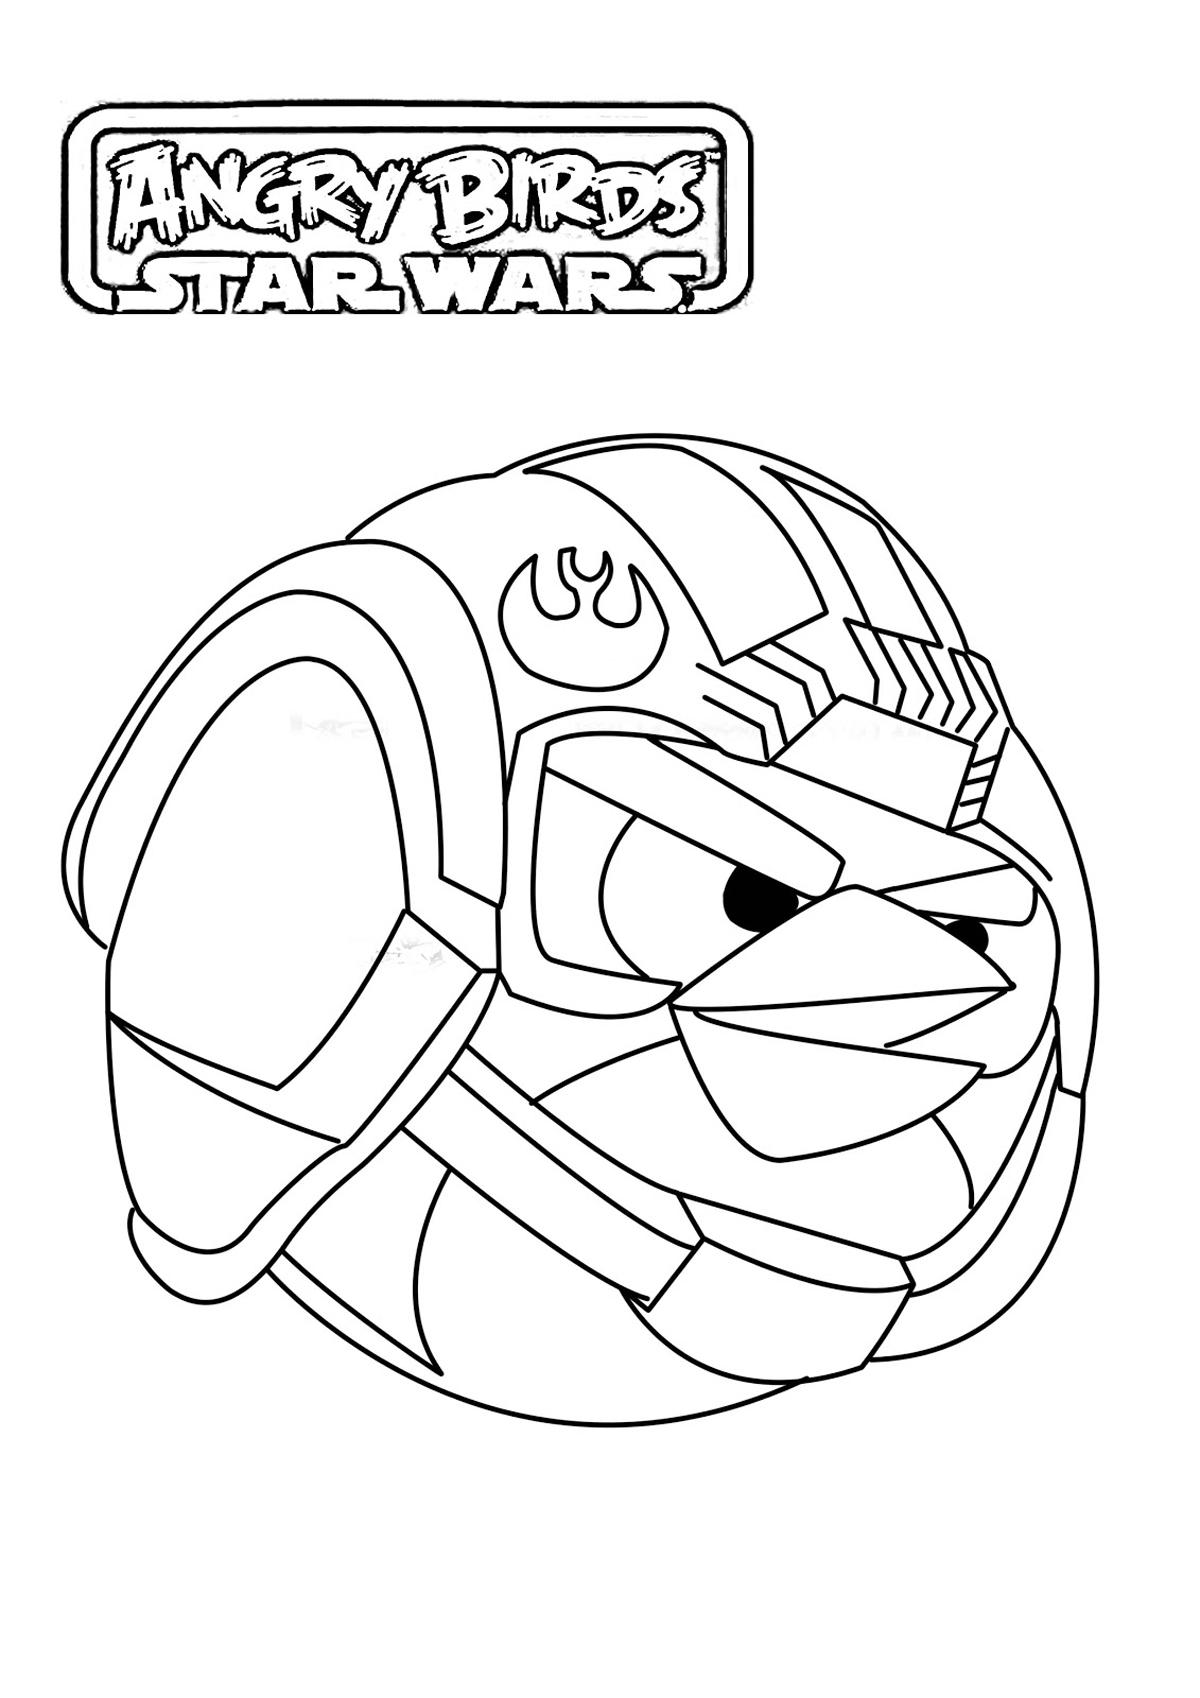 Beau Dessin Coloriage Imprimer Star Wars